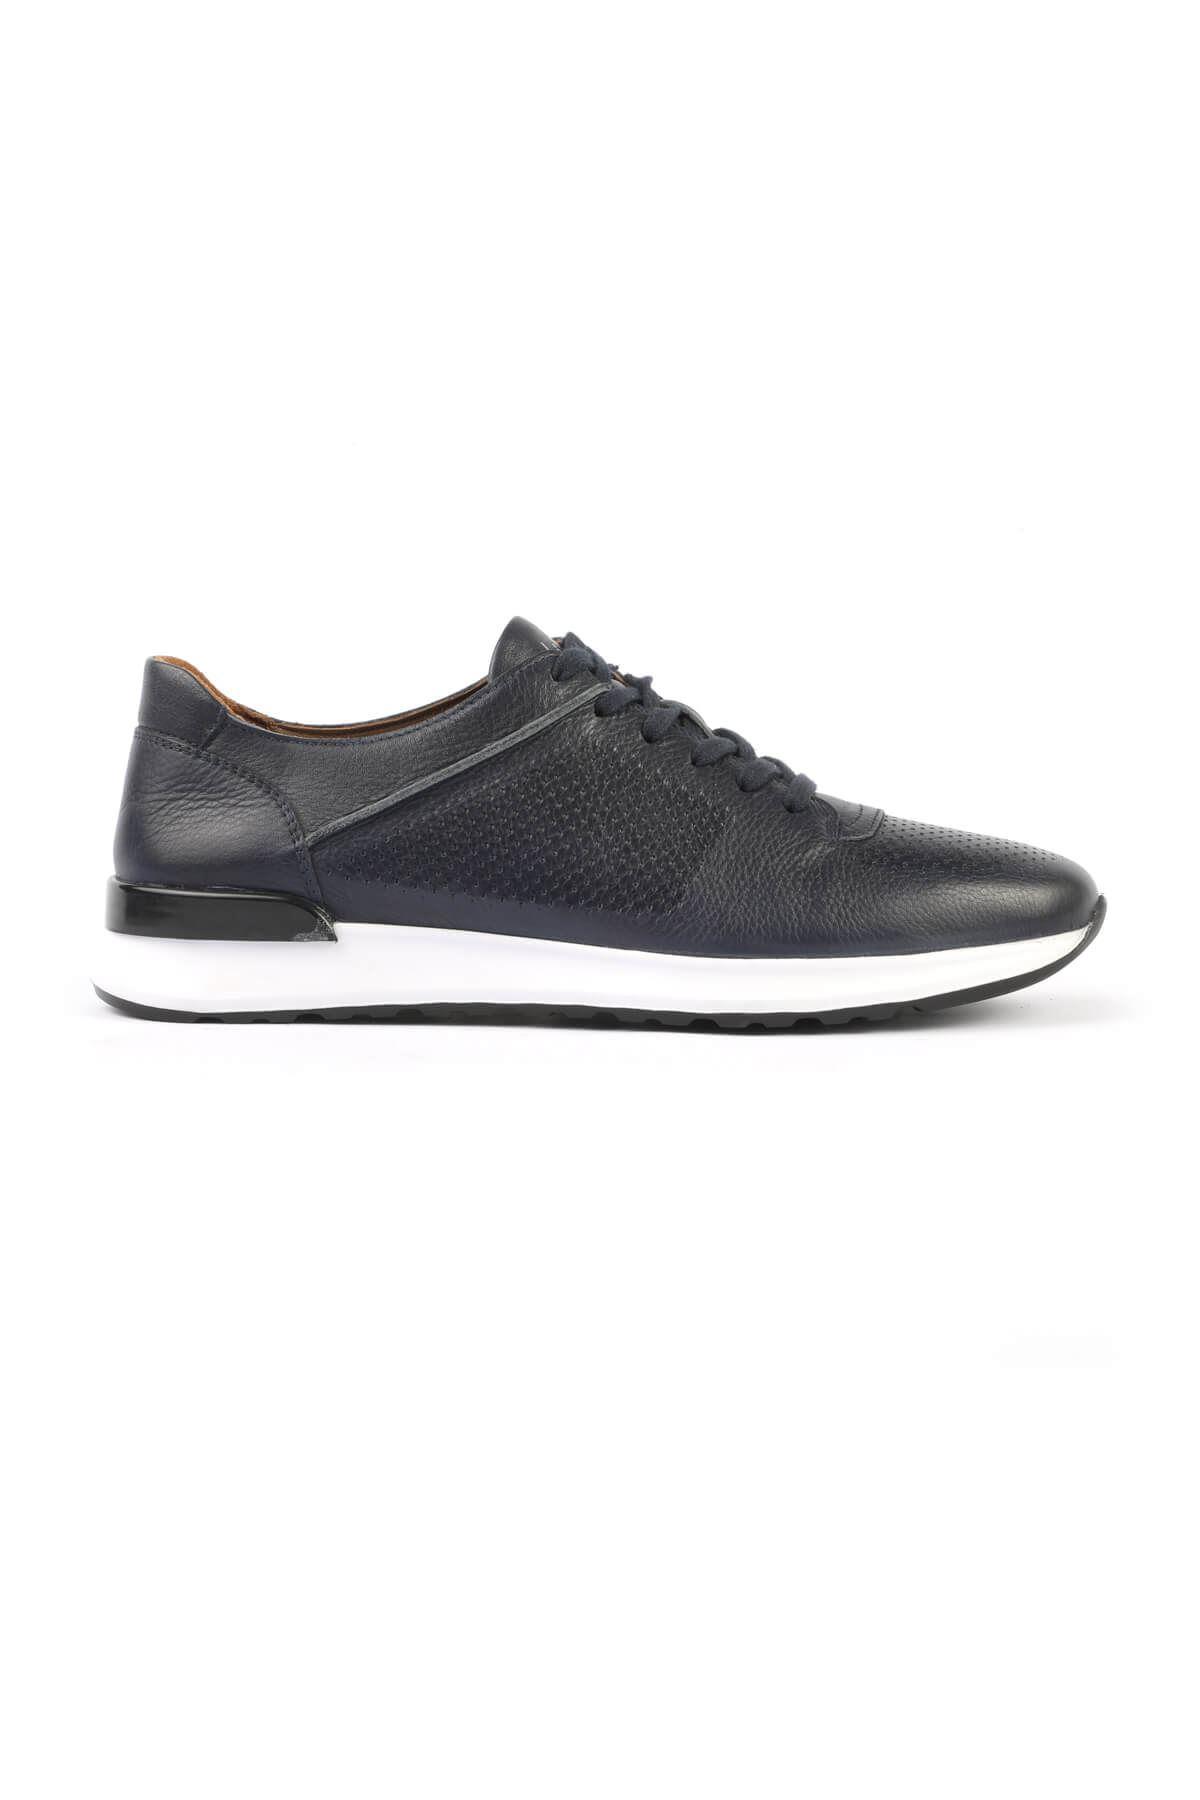 Libero L3045 L. White Sport Shoes